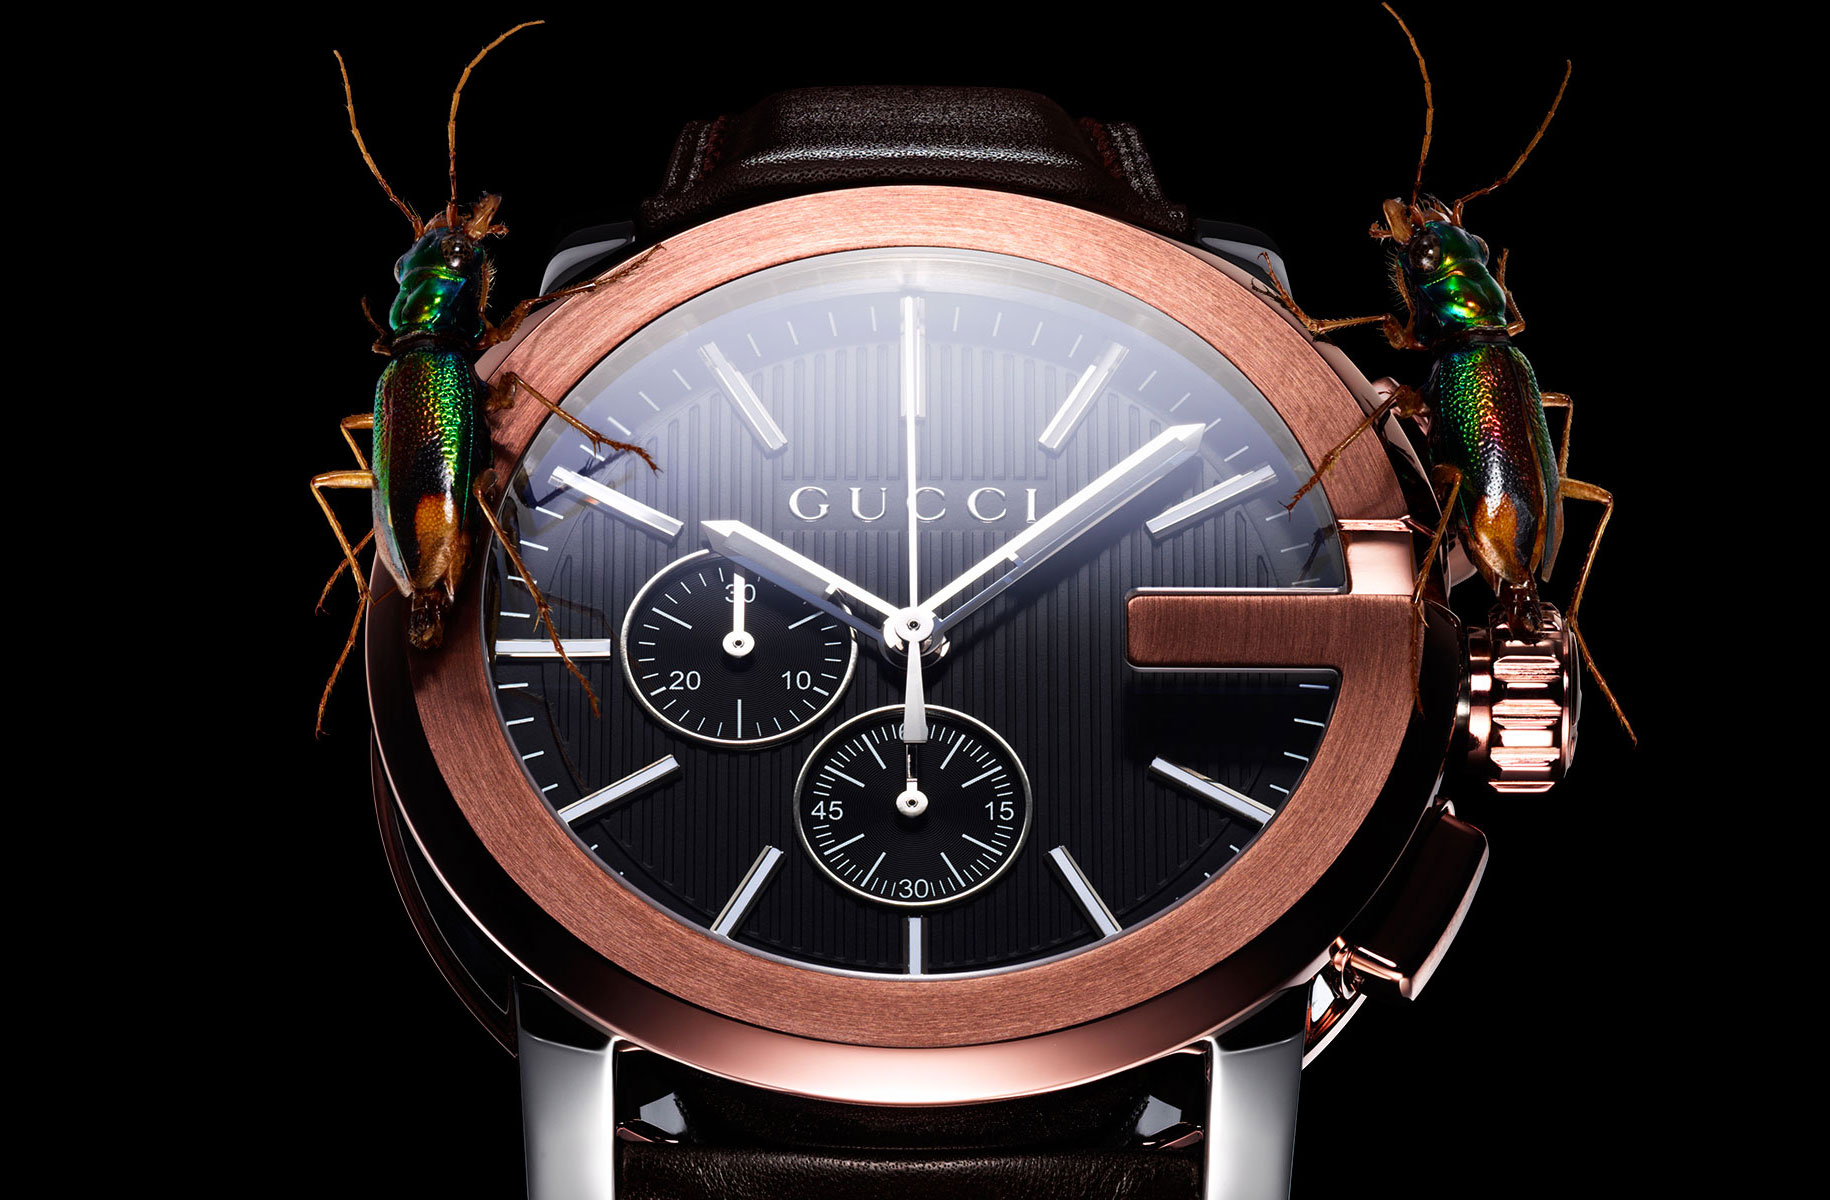 140515_043014_EH_watch_gucci_fin.jpg